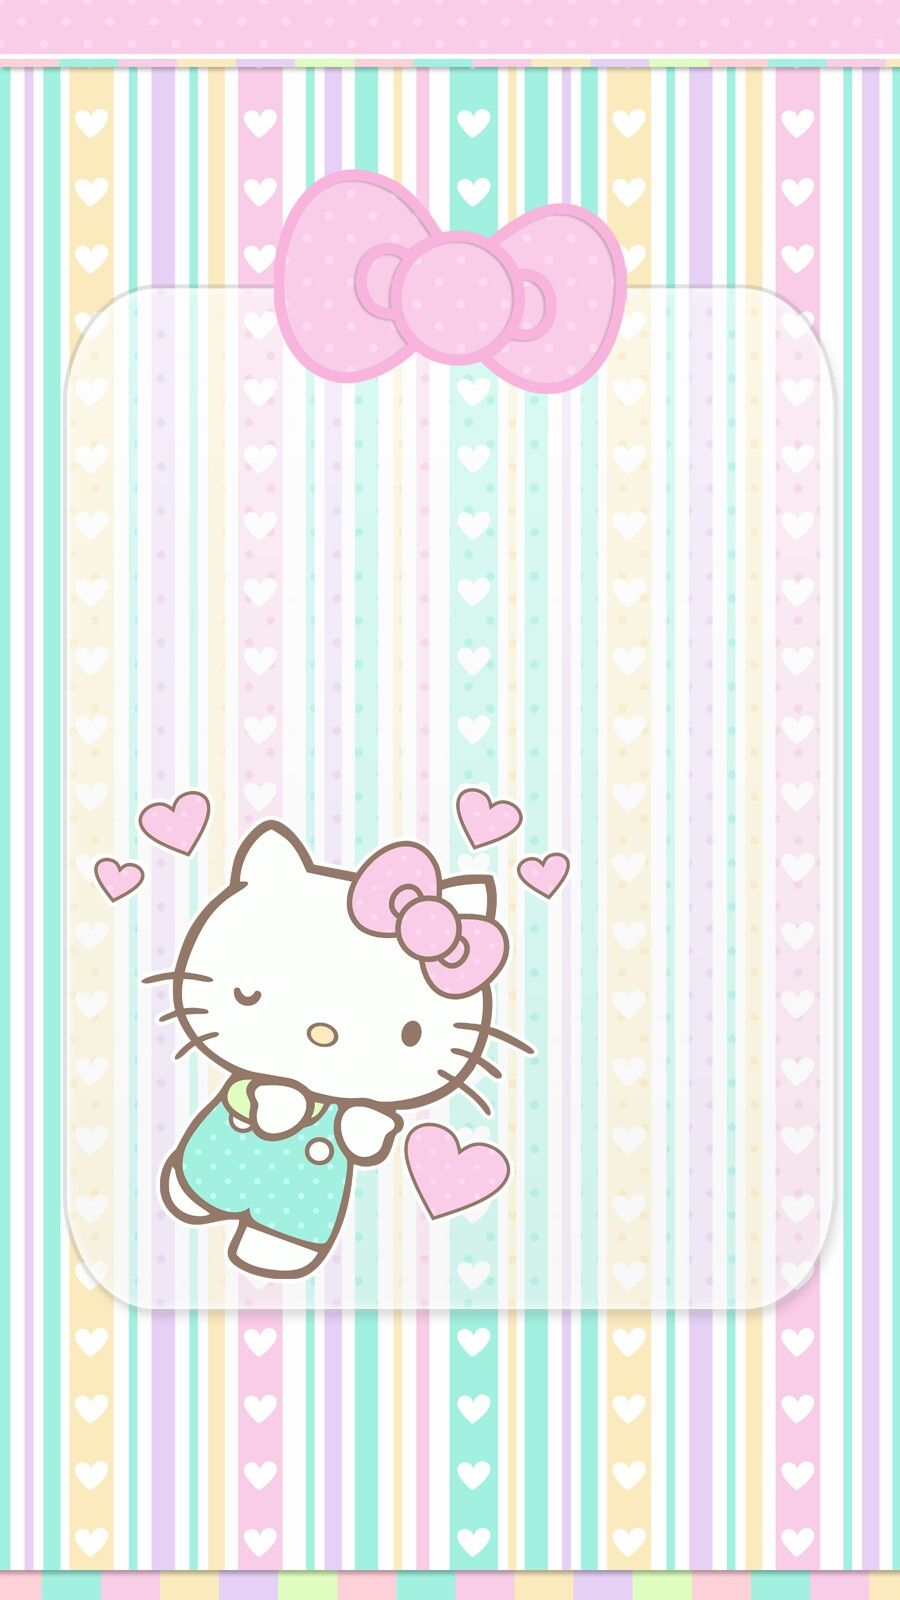 Good Wallpaper Hello Kitty Turquoise - c92883d7271cfd4f9daebcc38bea1582  Gallery_92669.jpg